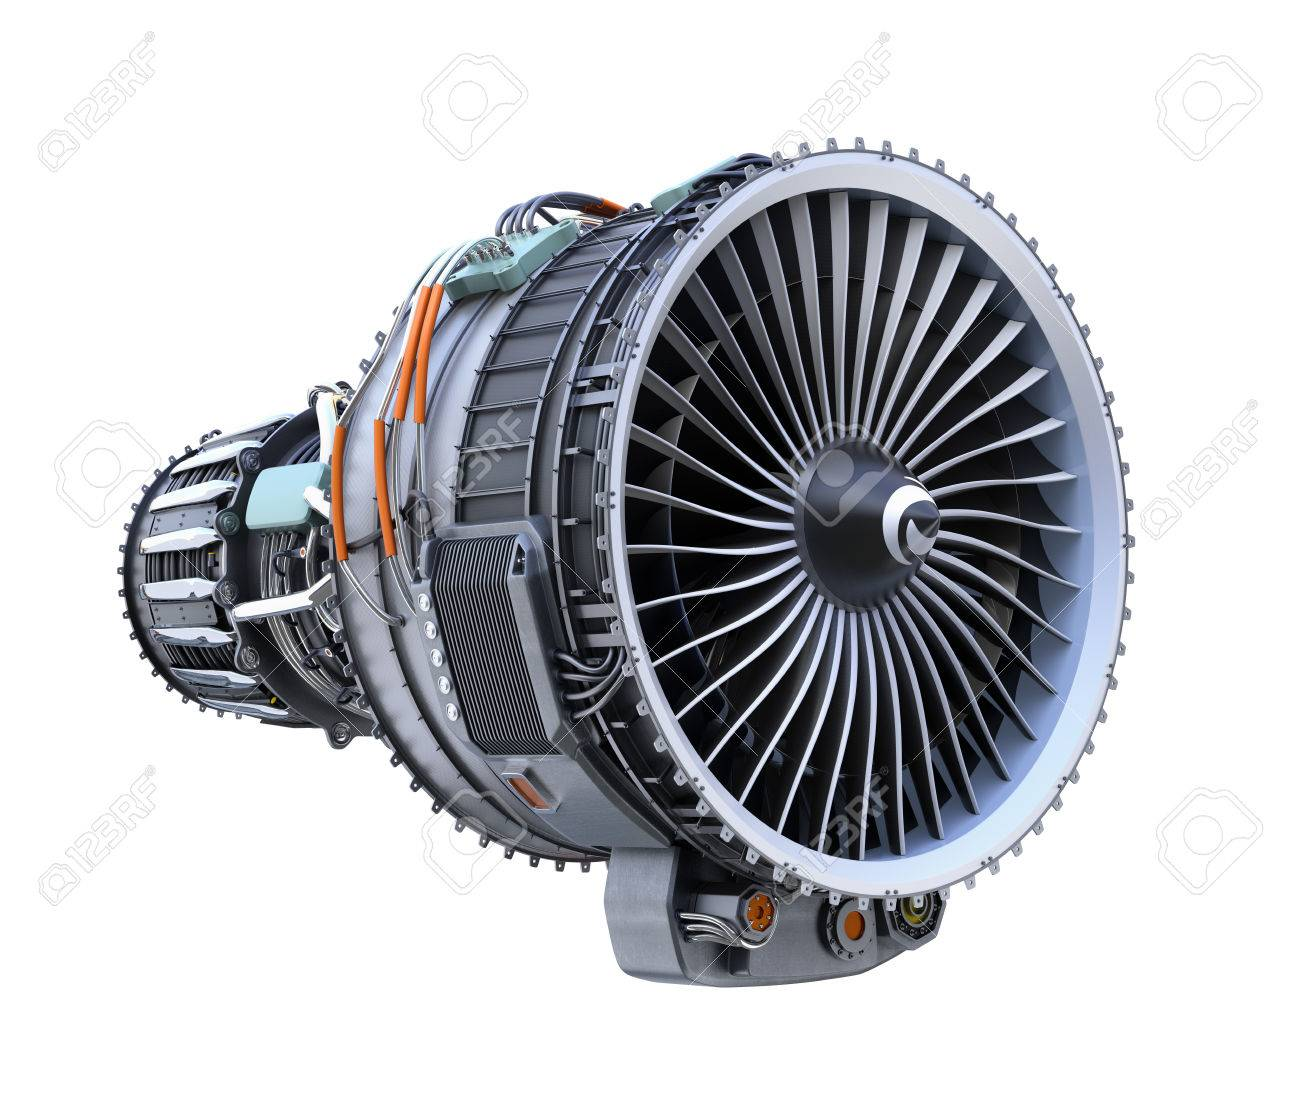 Turbofan jet engine isolated on white background  3D rendering